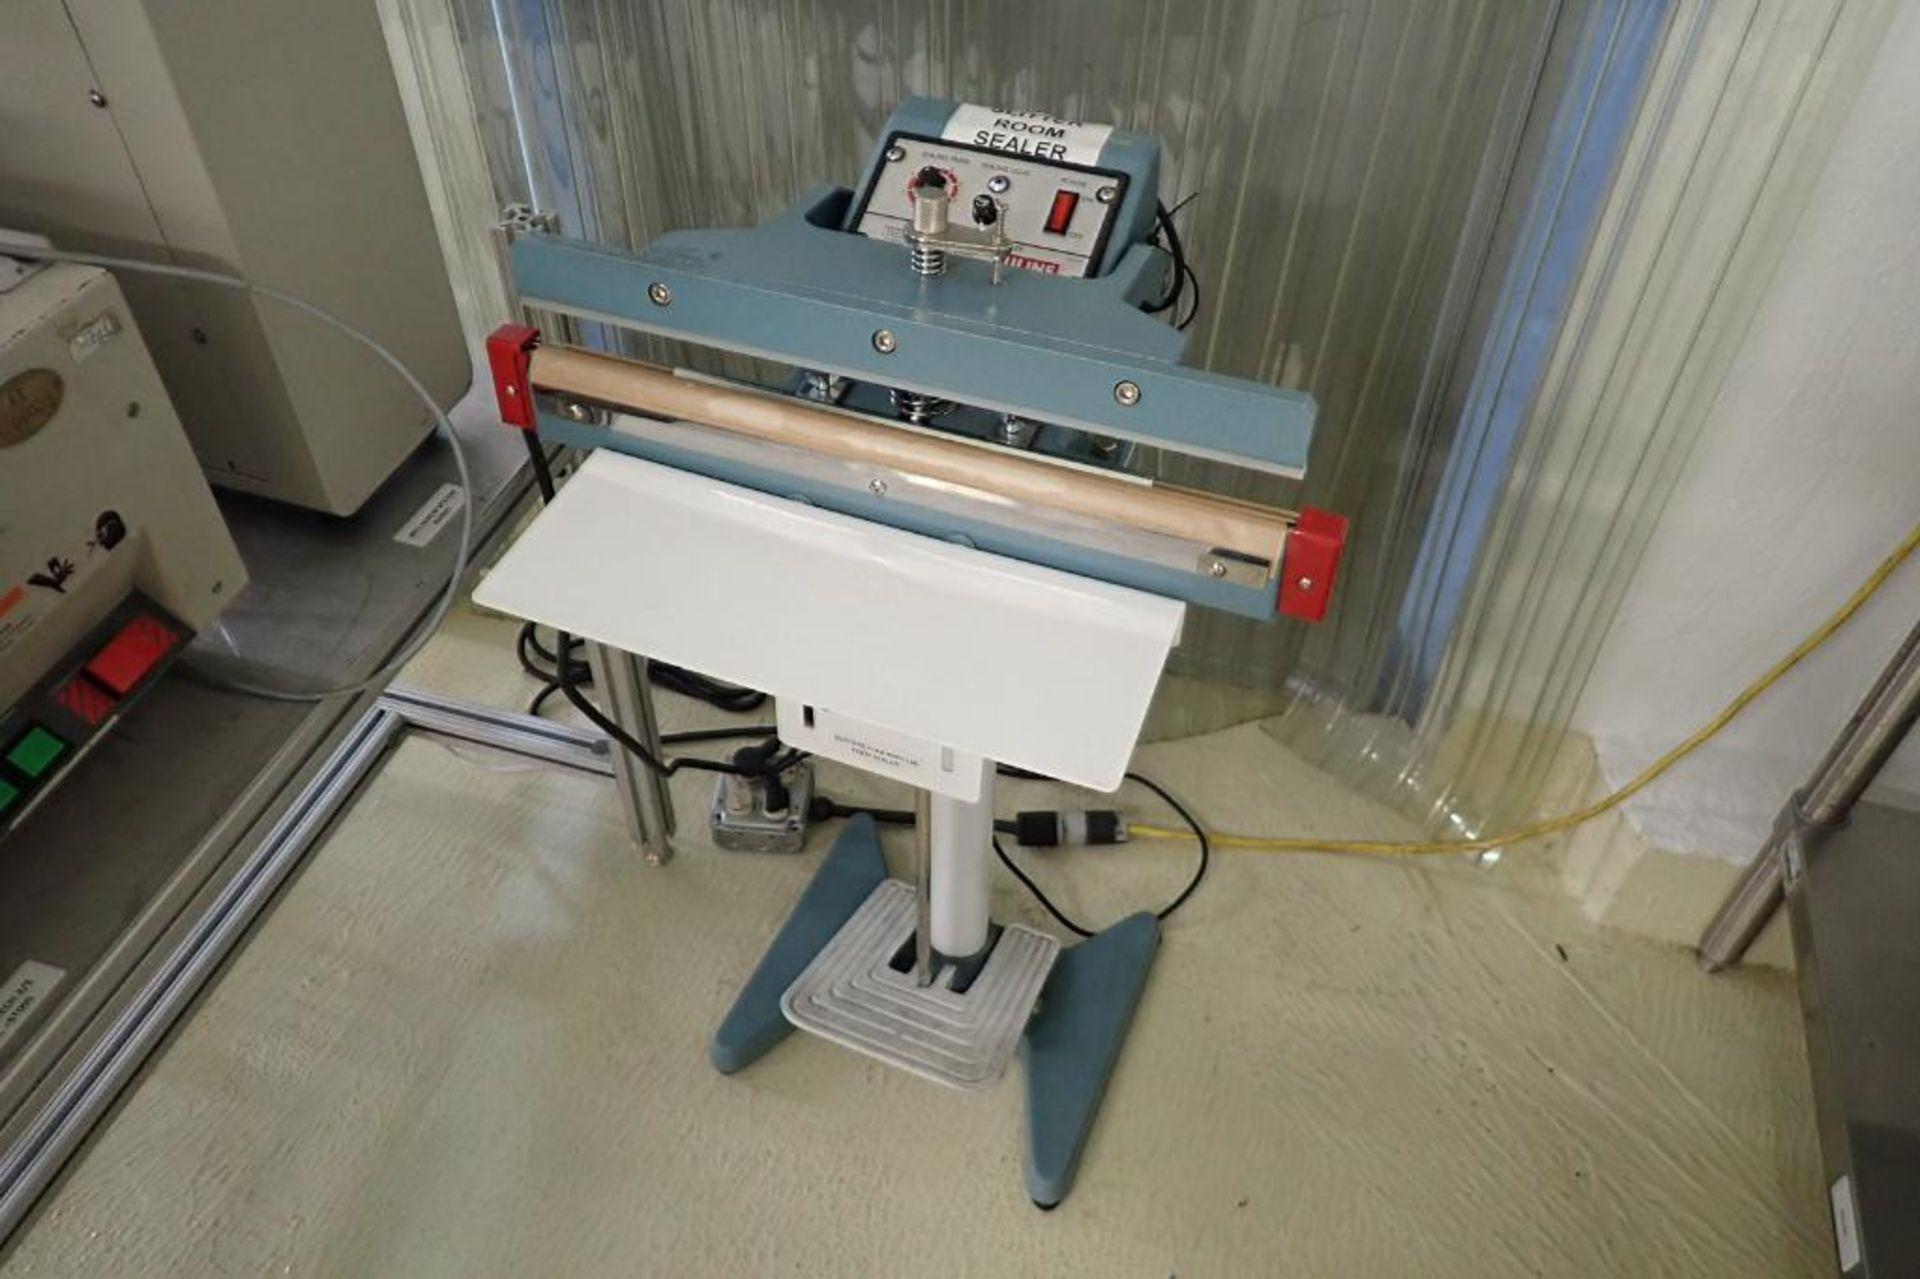 Lot 16 - Uline impulse foot sealer, Model H89, 18 in. seal bar, foot operated { Rigging Fee: $25}